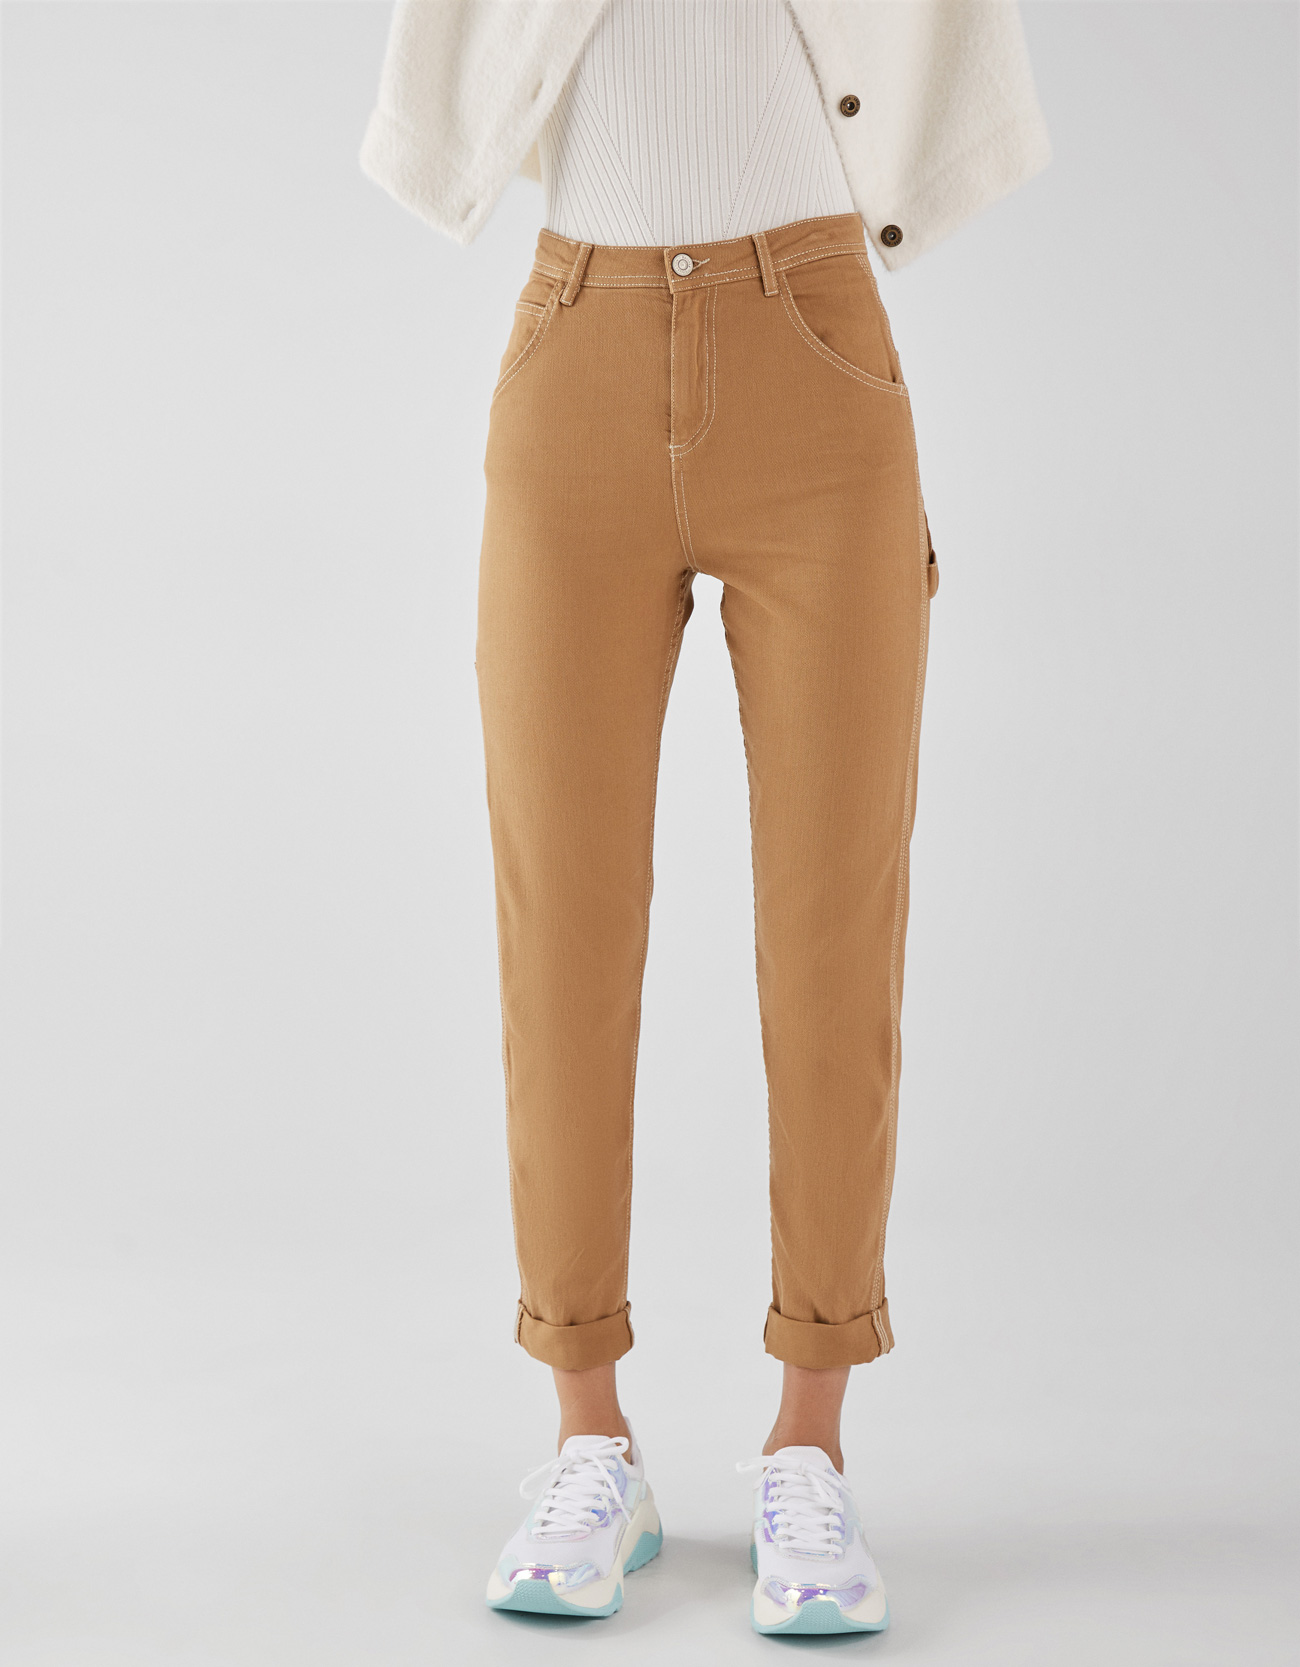 Farblich abgesetzte Hose im Relaxed-Fit